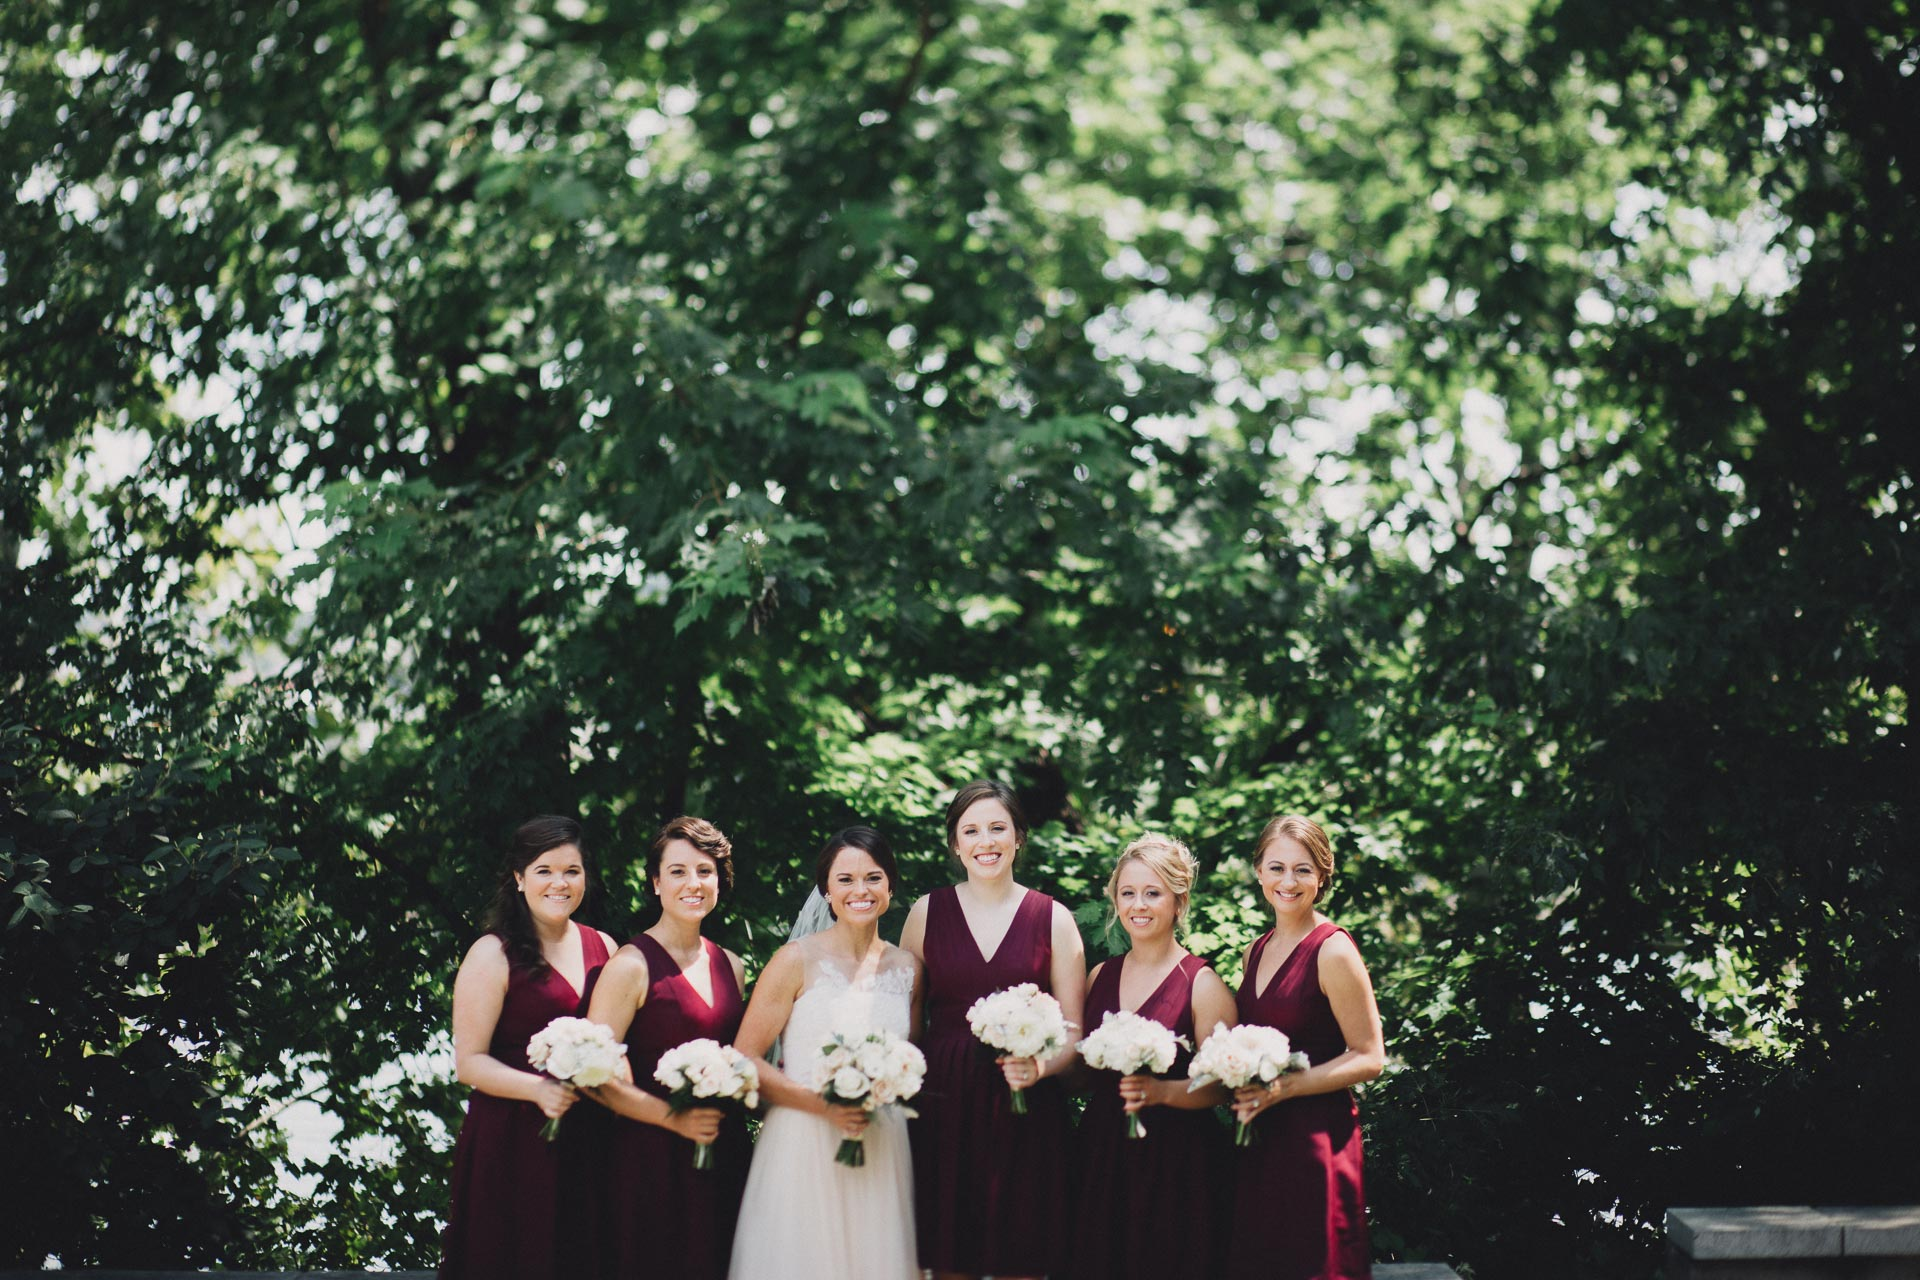 Emily-Eddie-Cincinnati-Rennaissance-Hotel-Wedding-042@2x.jpg